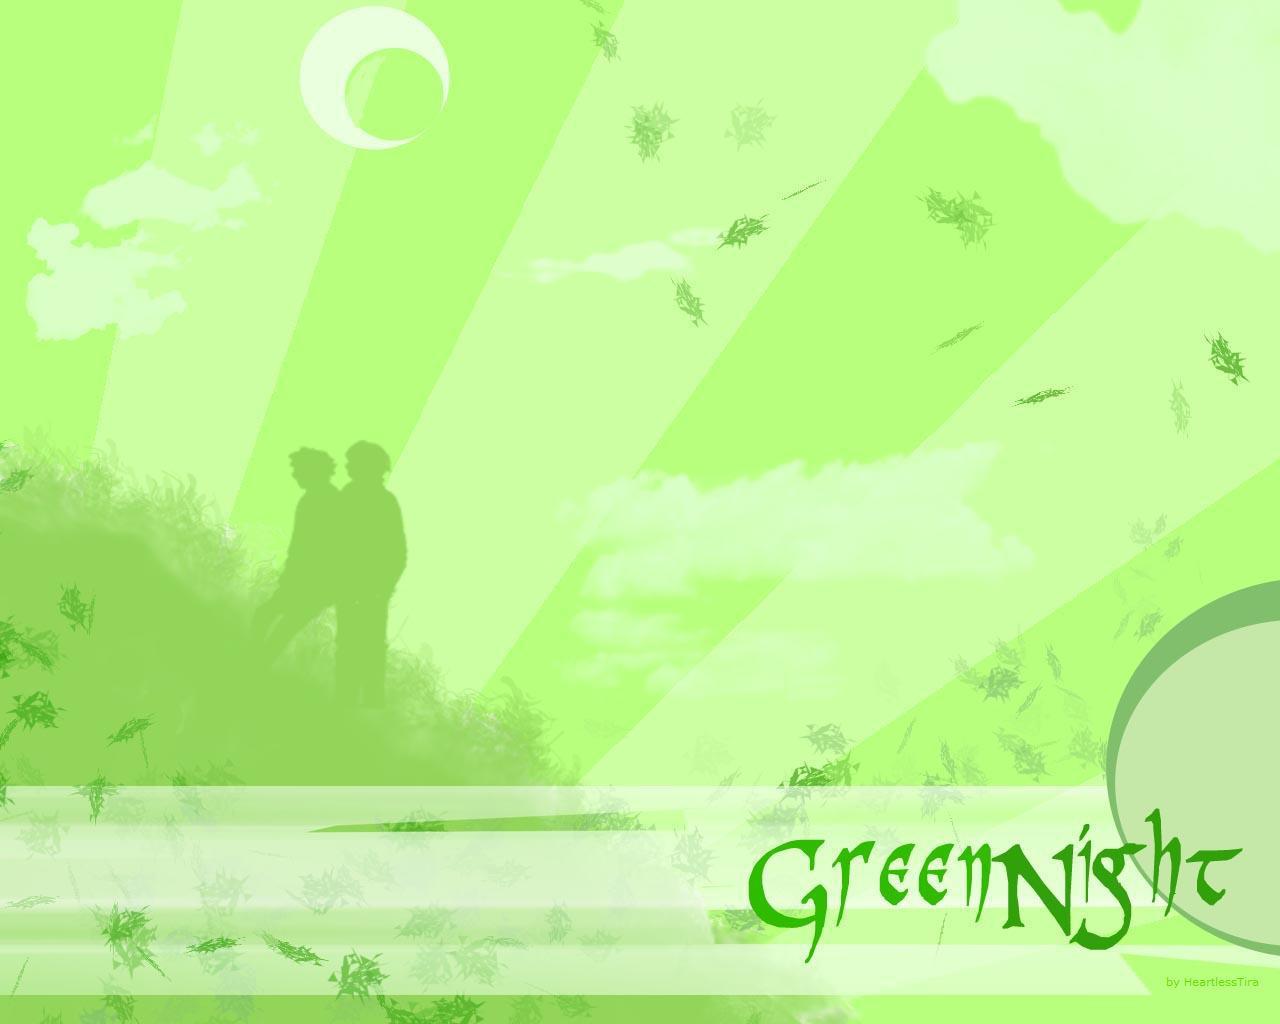 GreenNight by HeartlessTira